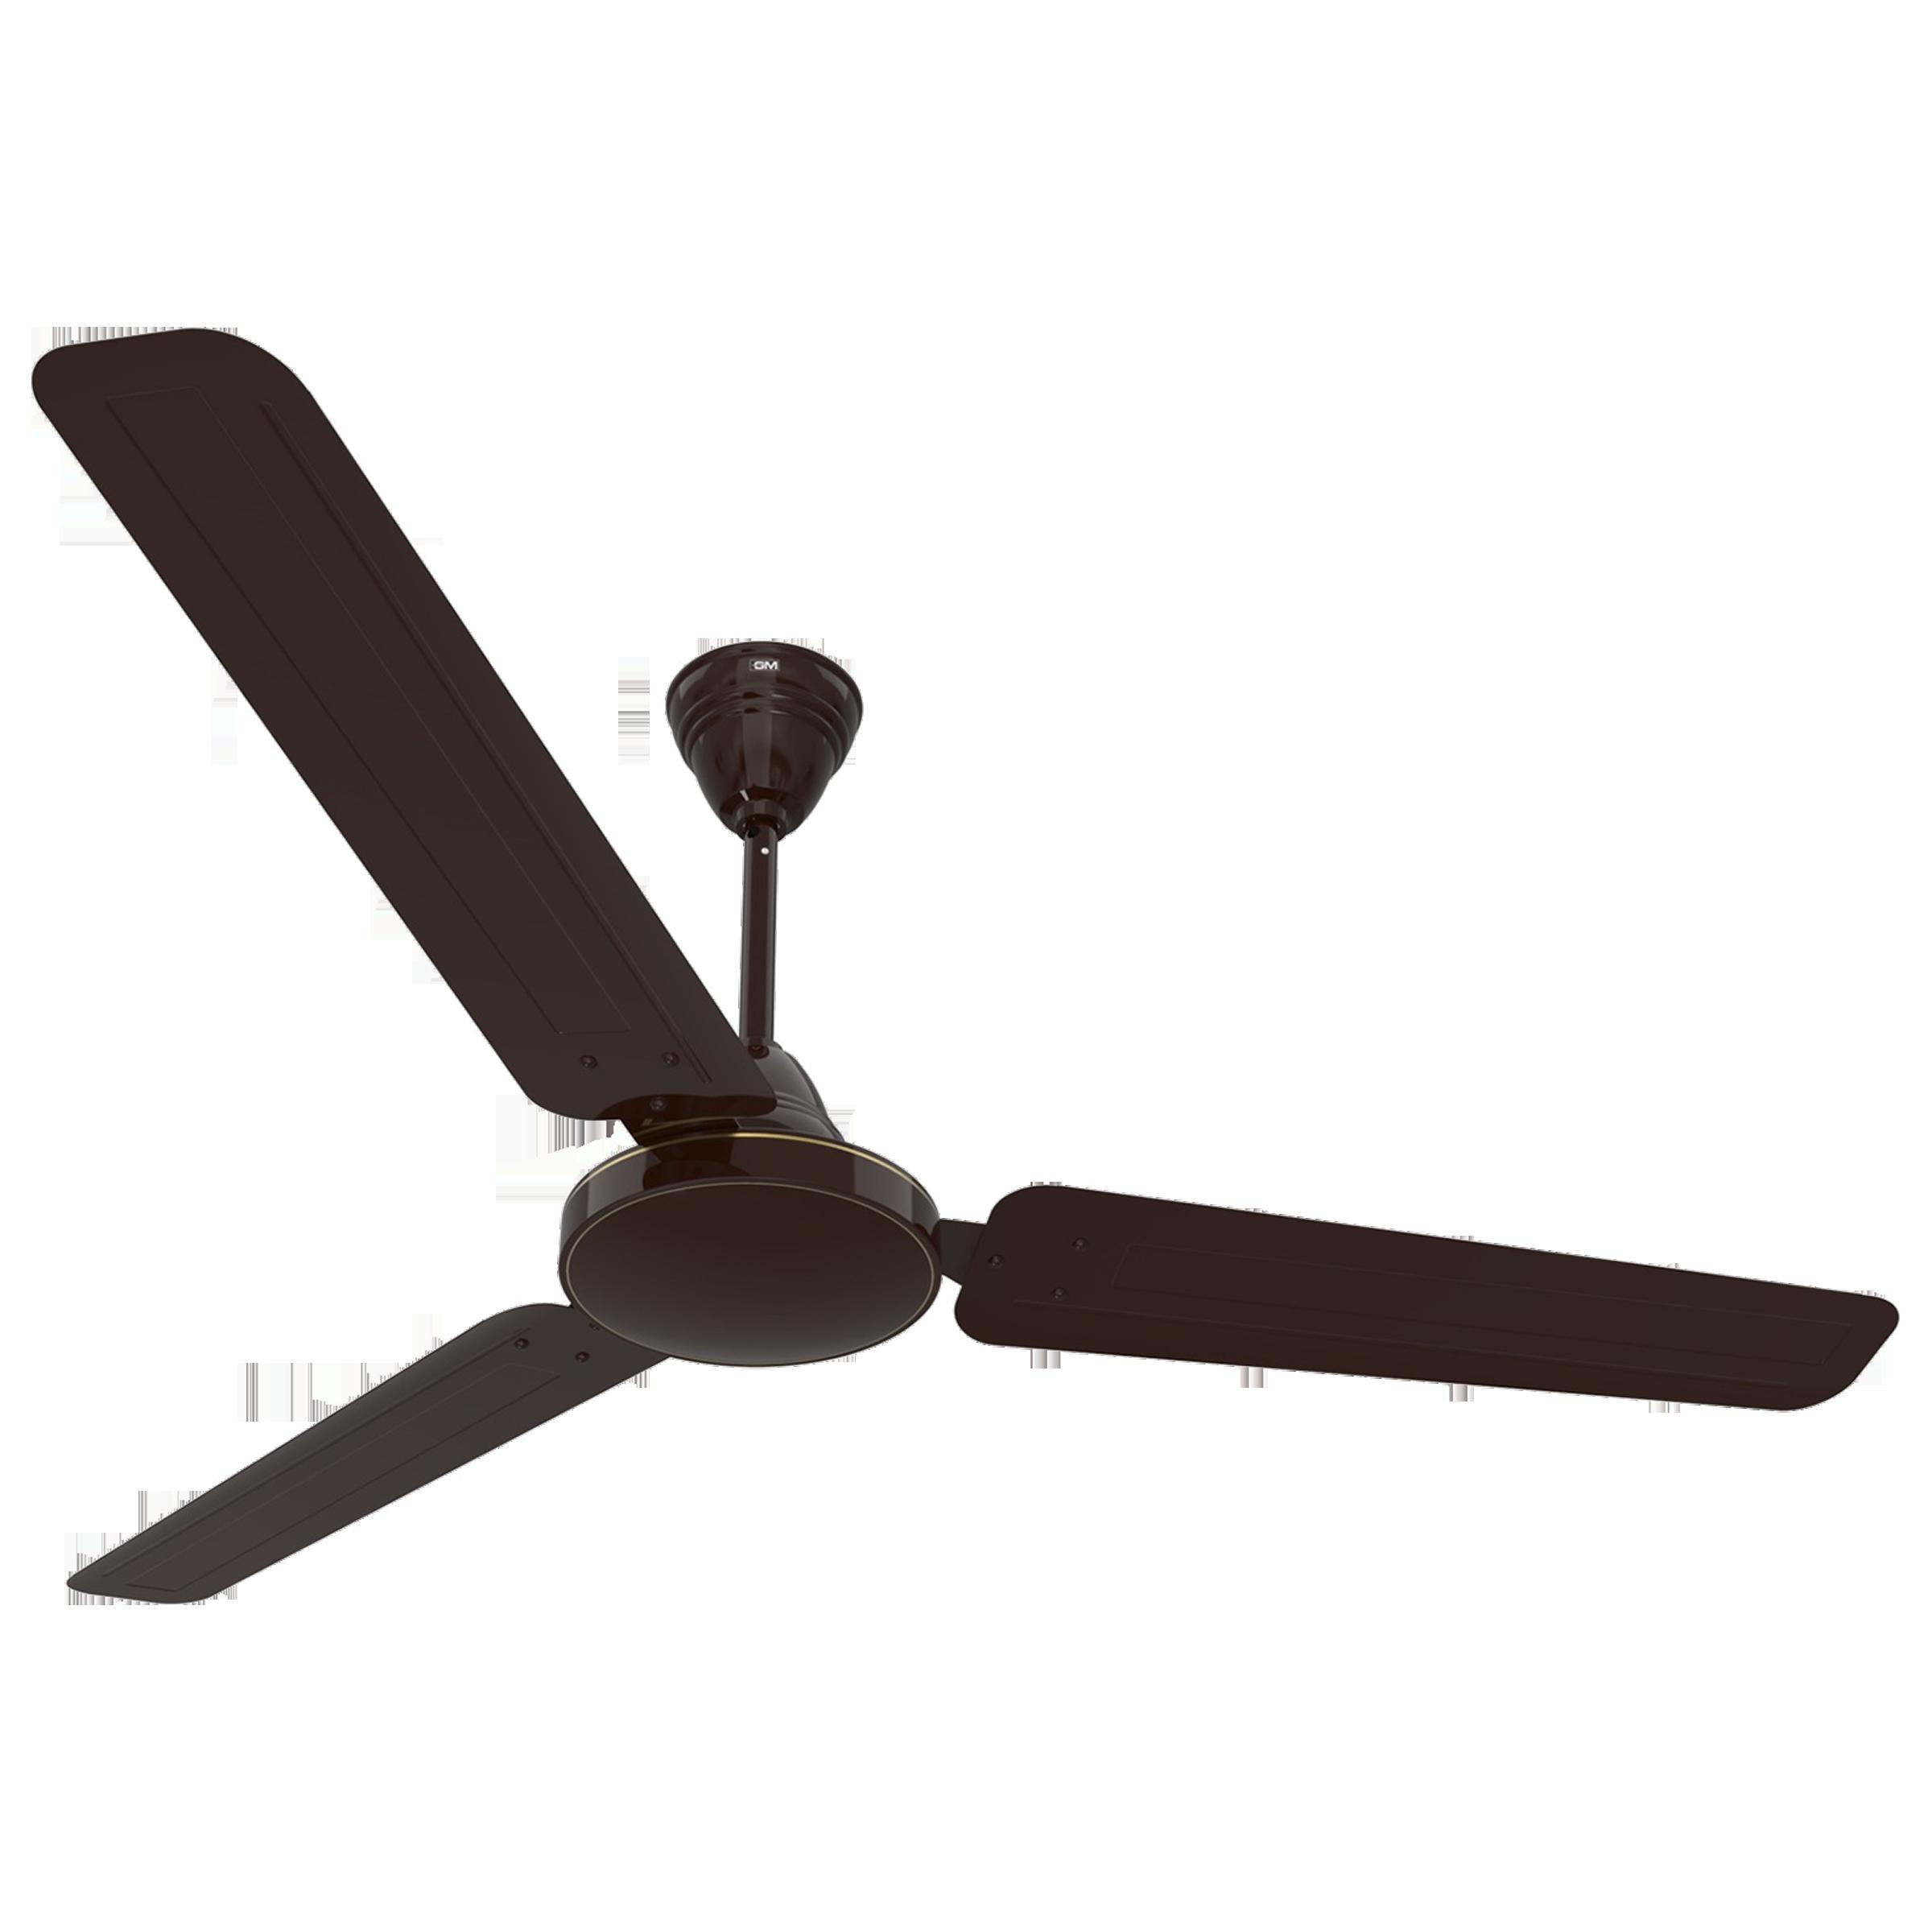 GM AIR9 Plus 120 cm Sweep 3 Blade Ceiling Fan (Double Ball Bearing, CFB480032BRGL, Brown)_1